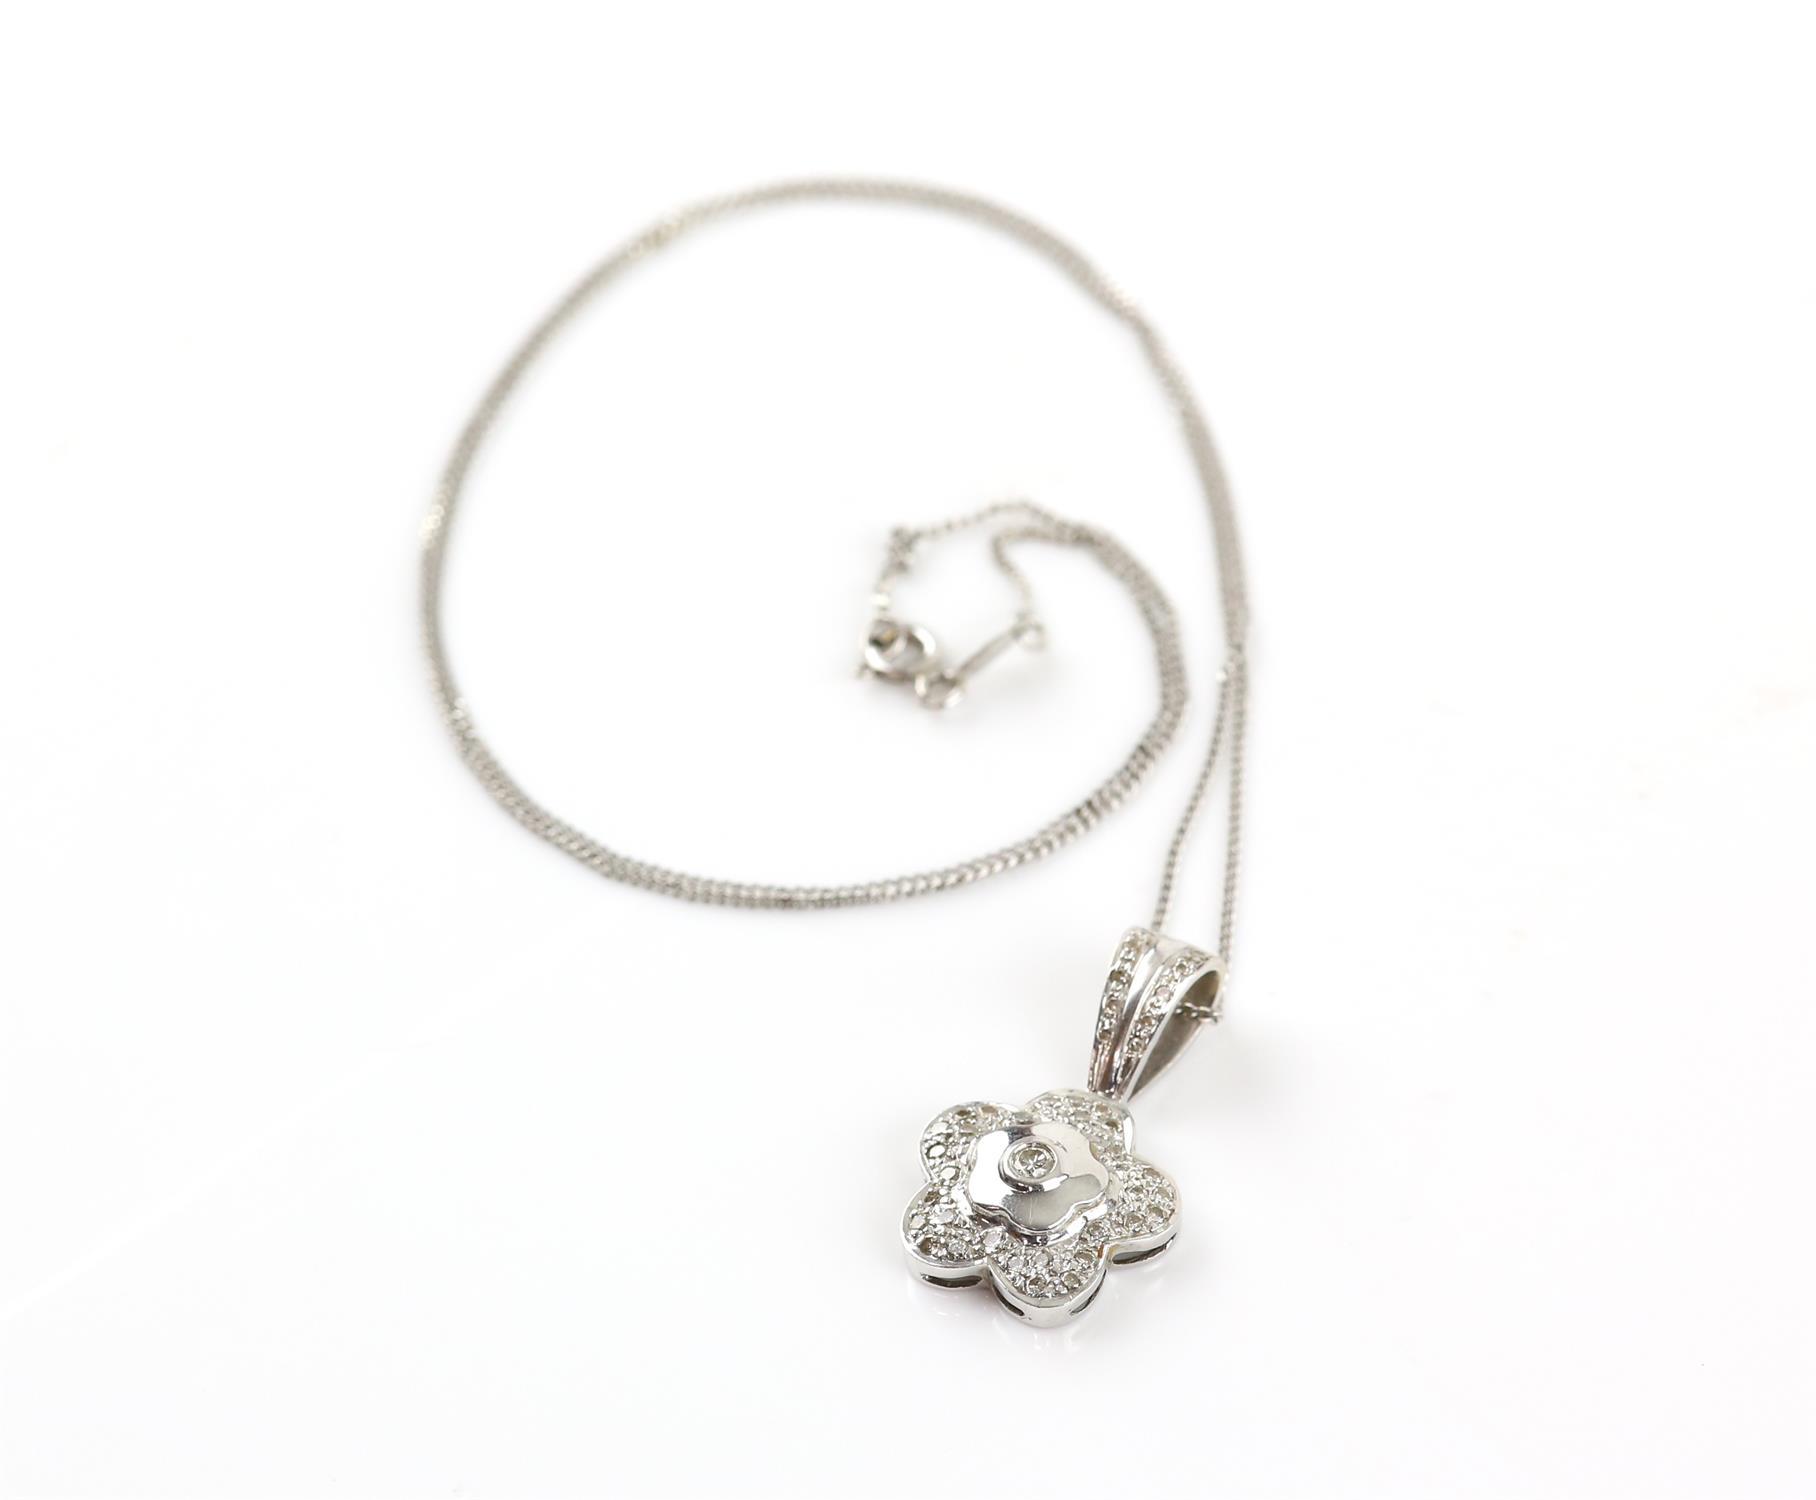 Diamond flower pendant, set with round brilliant cut diamonds, on a diamond set bail, - Image 3 of 3